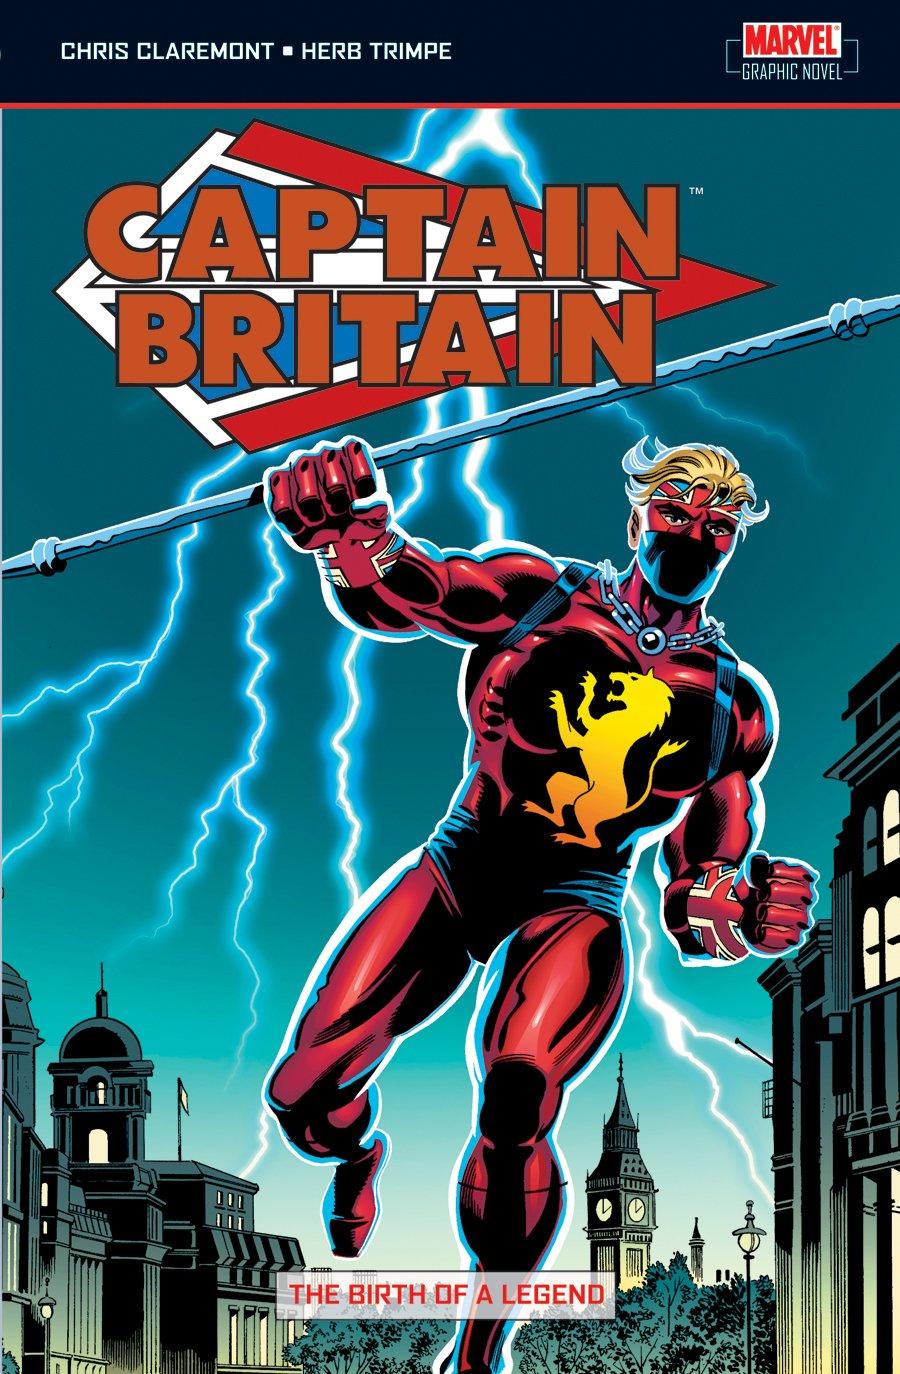 Captain Britain Vol.1: Birth Of A Legend: UK Captain Britain Vol.1 #1-39, Super Spider-Man #231, MTU #65-66: Birth of a Legend v. 1: Amazon.es: Claremont, Chris, Trimpe, Herb: Libros en idiomas extranjeros